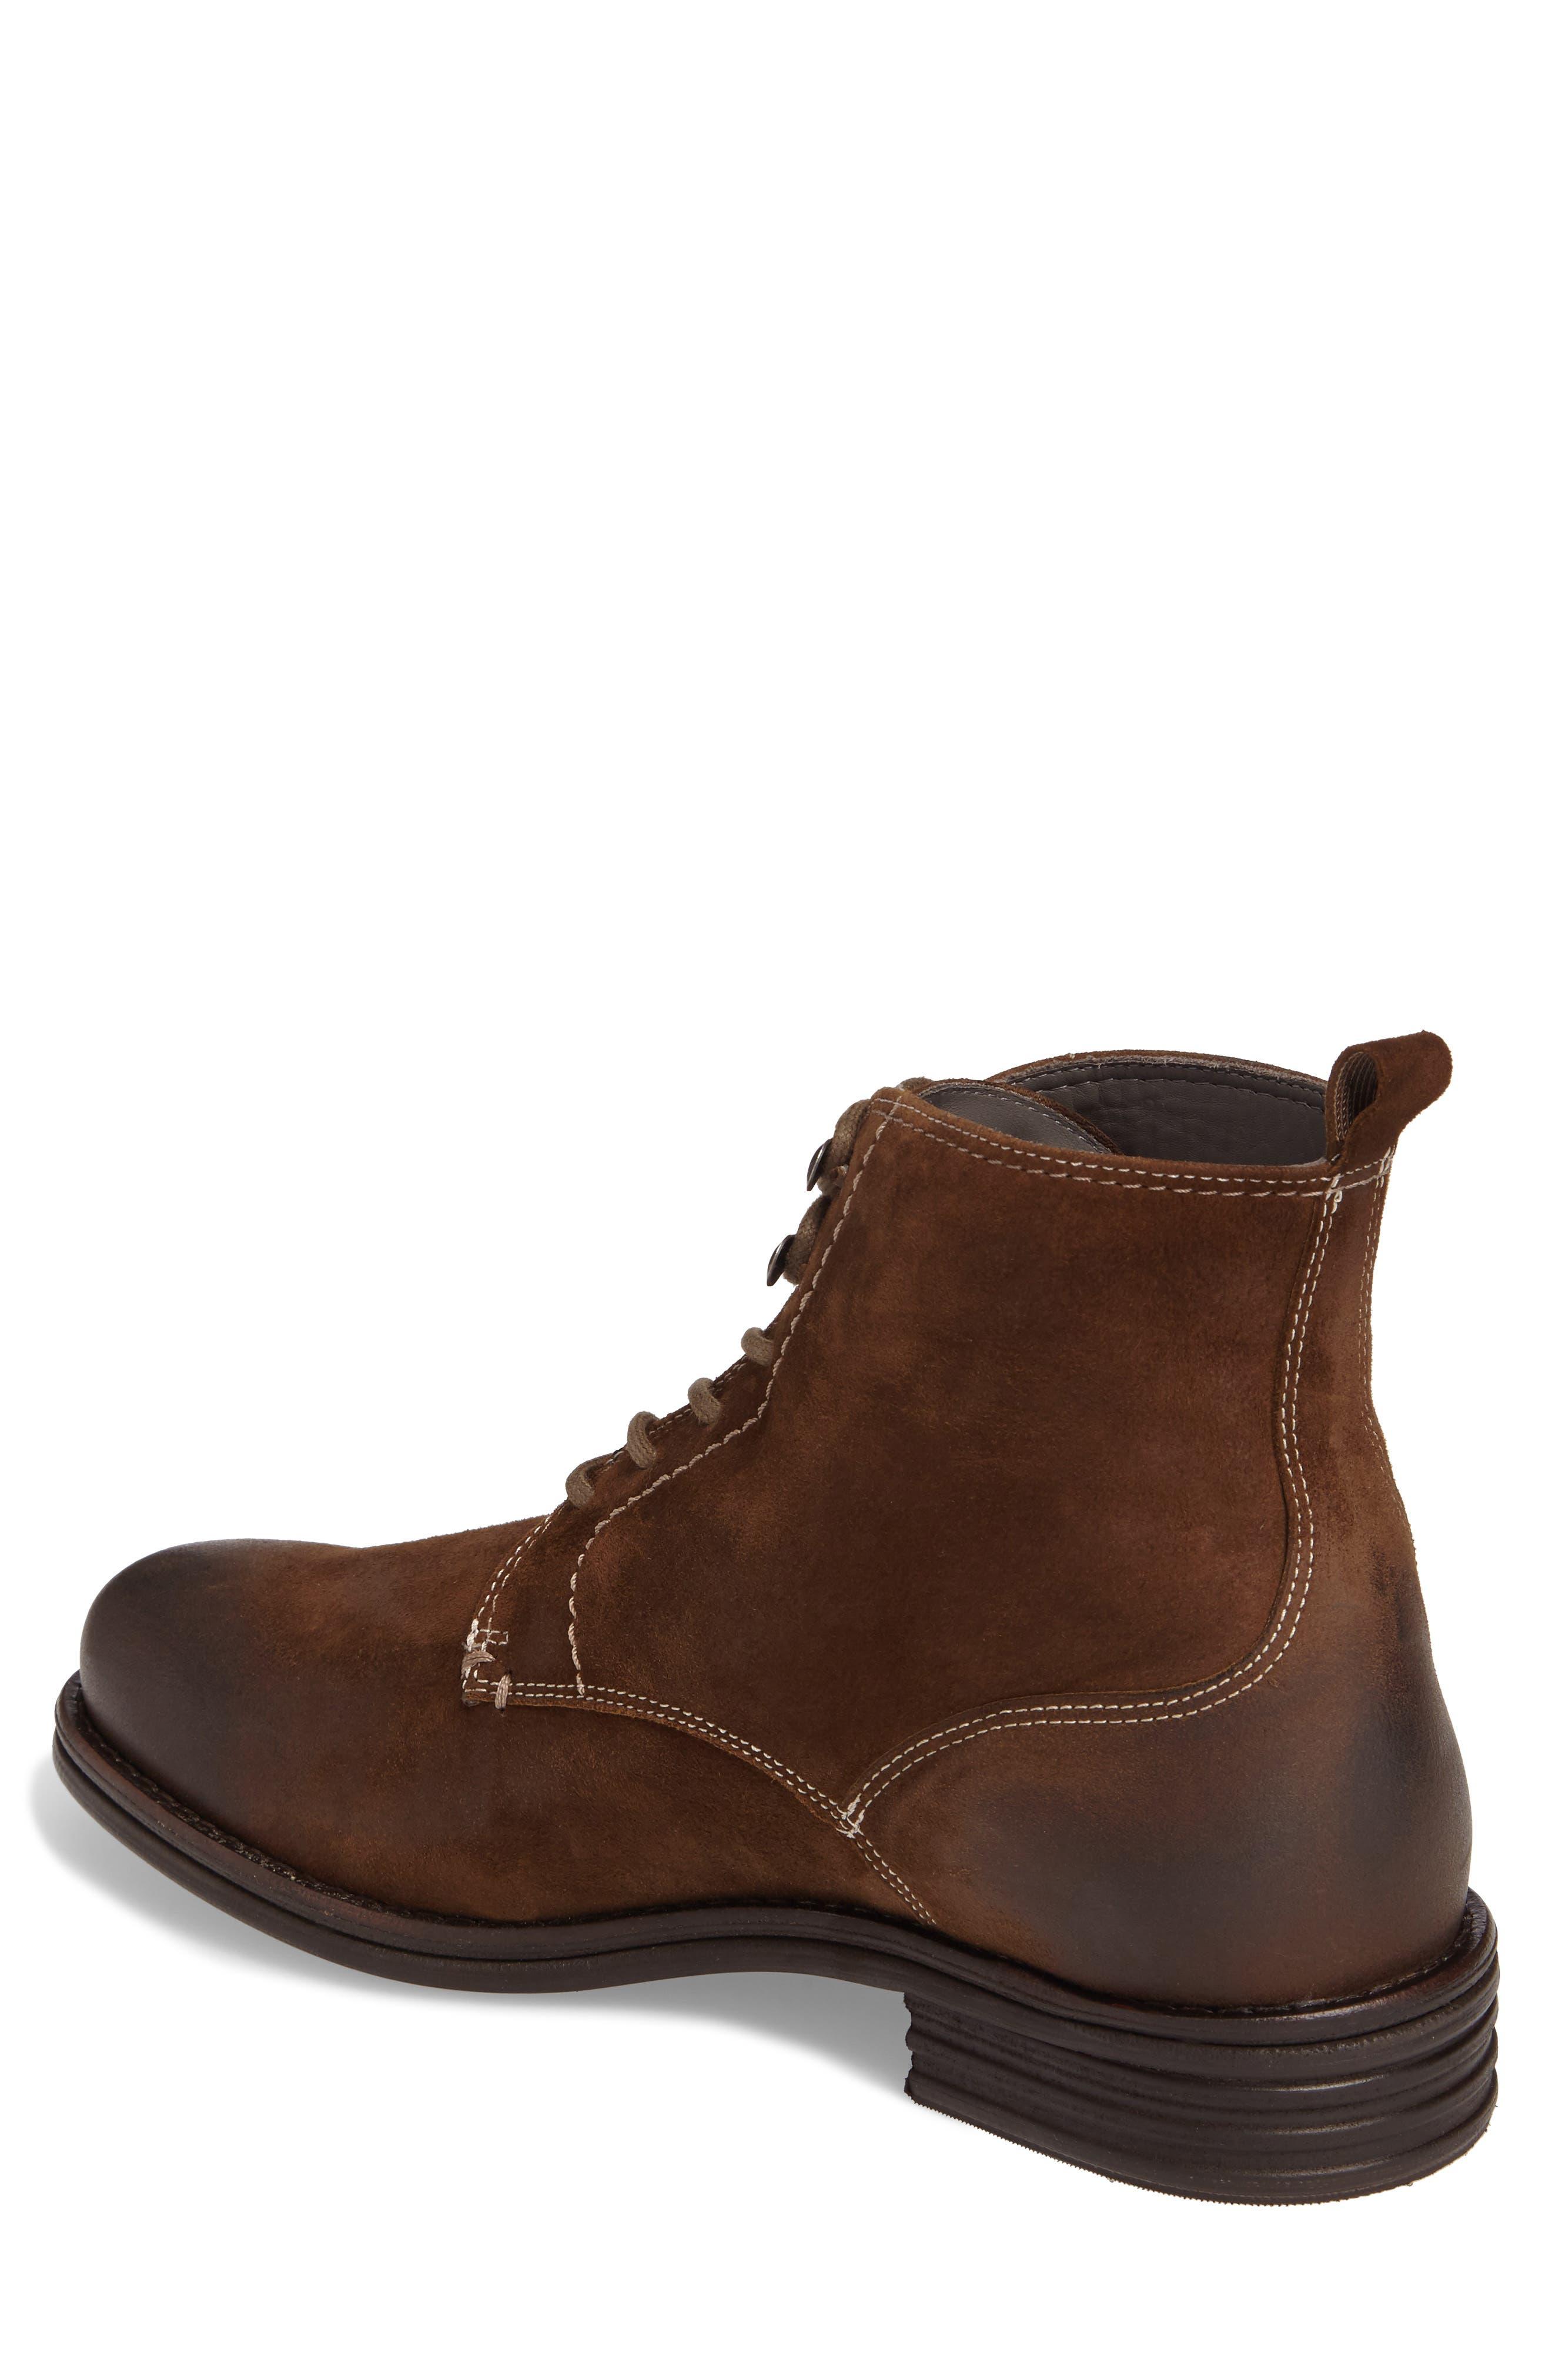 Cordie Plain Toe Boot,                             Alternate thumbnail 2, color,                             Oliva Suede